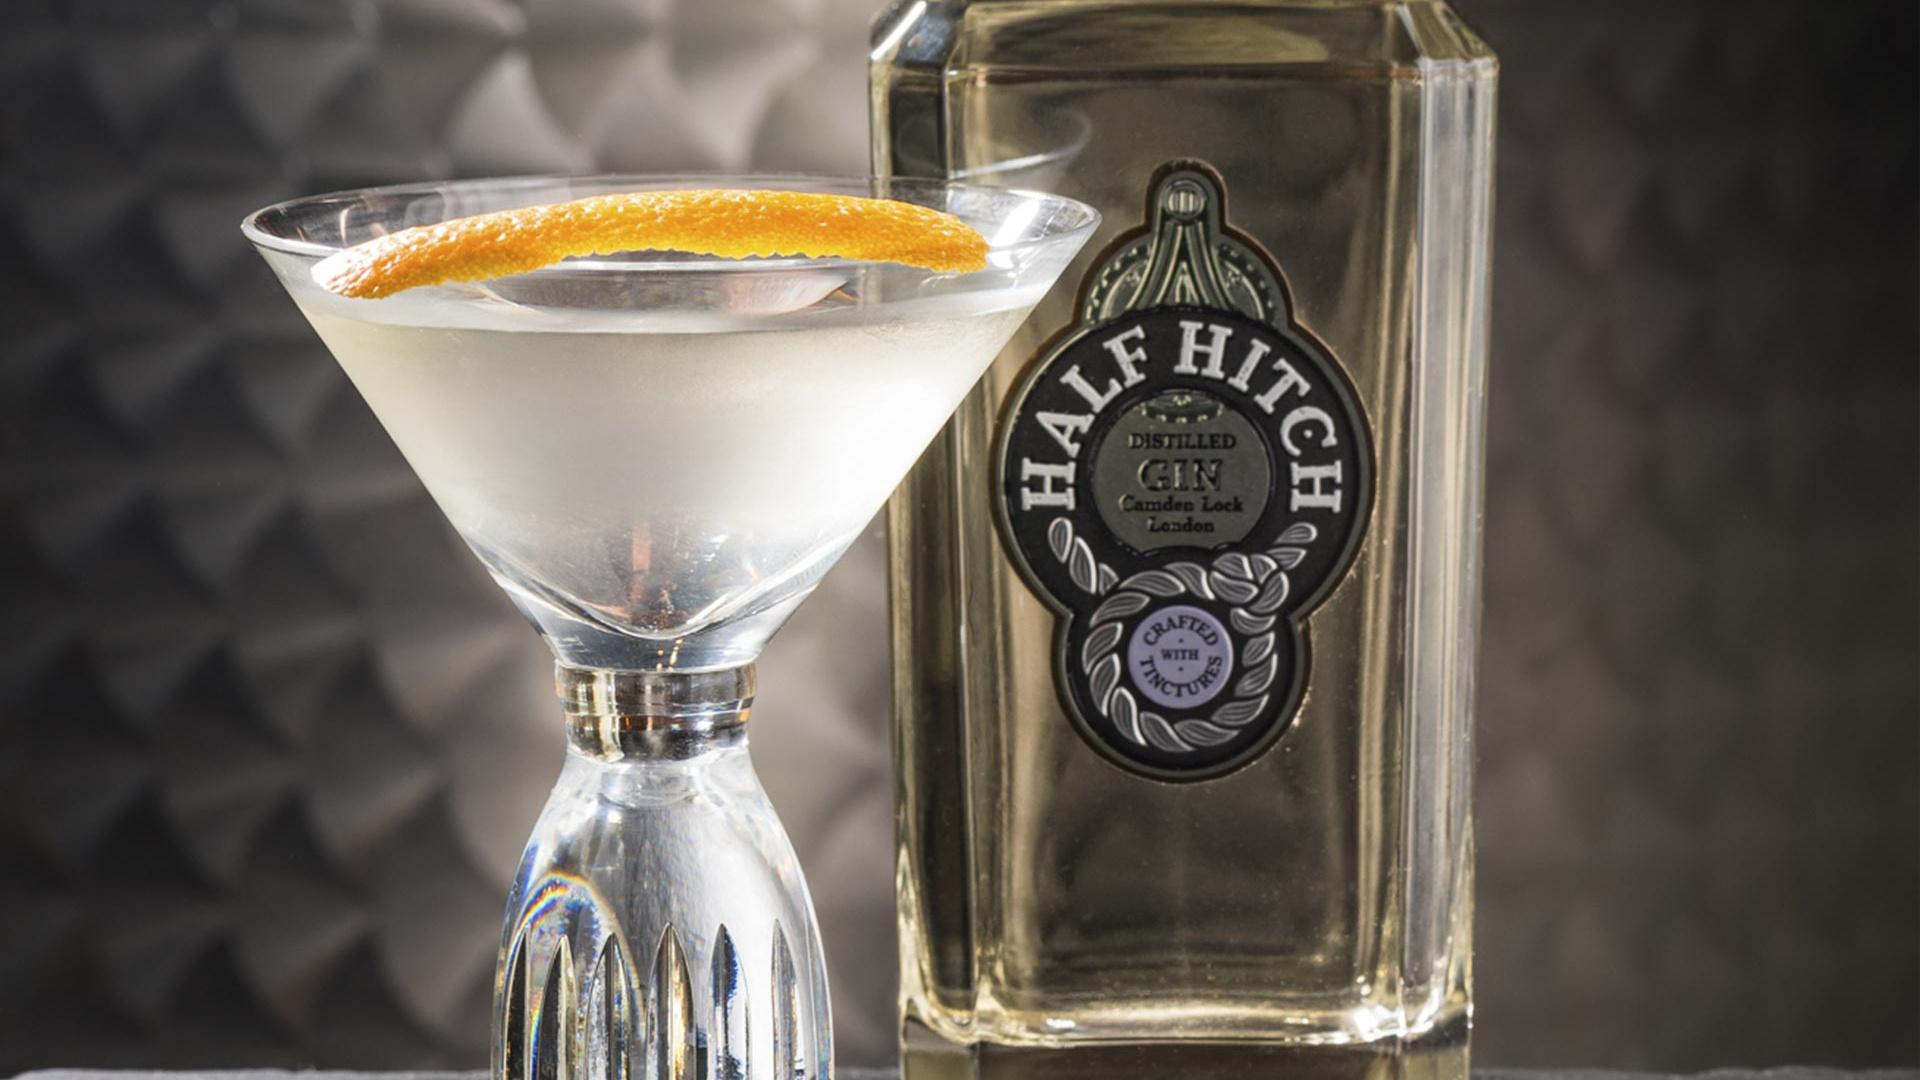 Half Hitch's Bronx cocktail